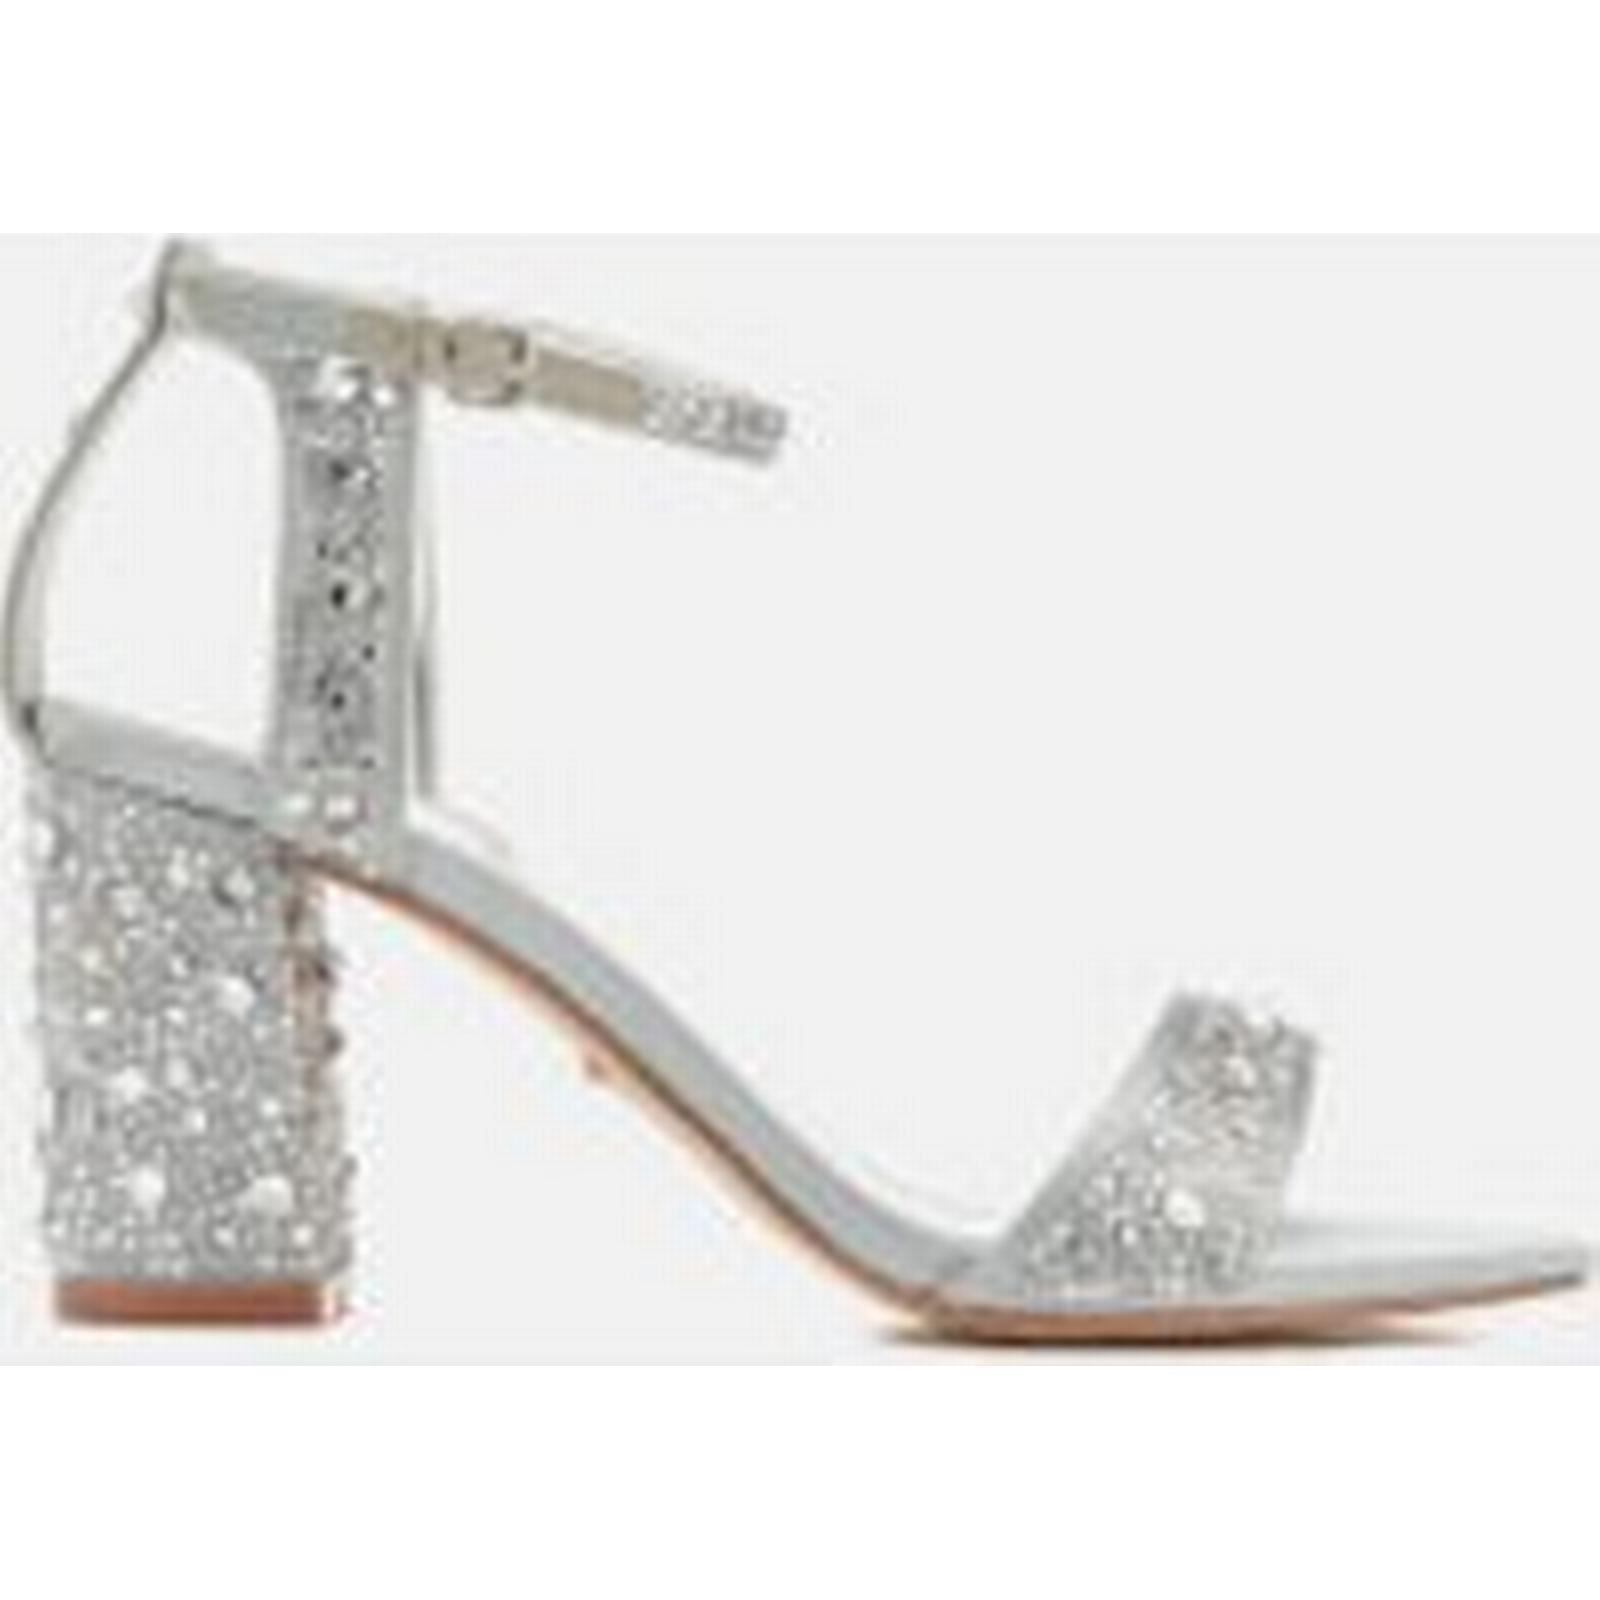 Carvela Women's Gigi Satin Blocked Grey Heeled Sandals - Grey Blocked 51499d